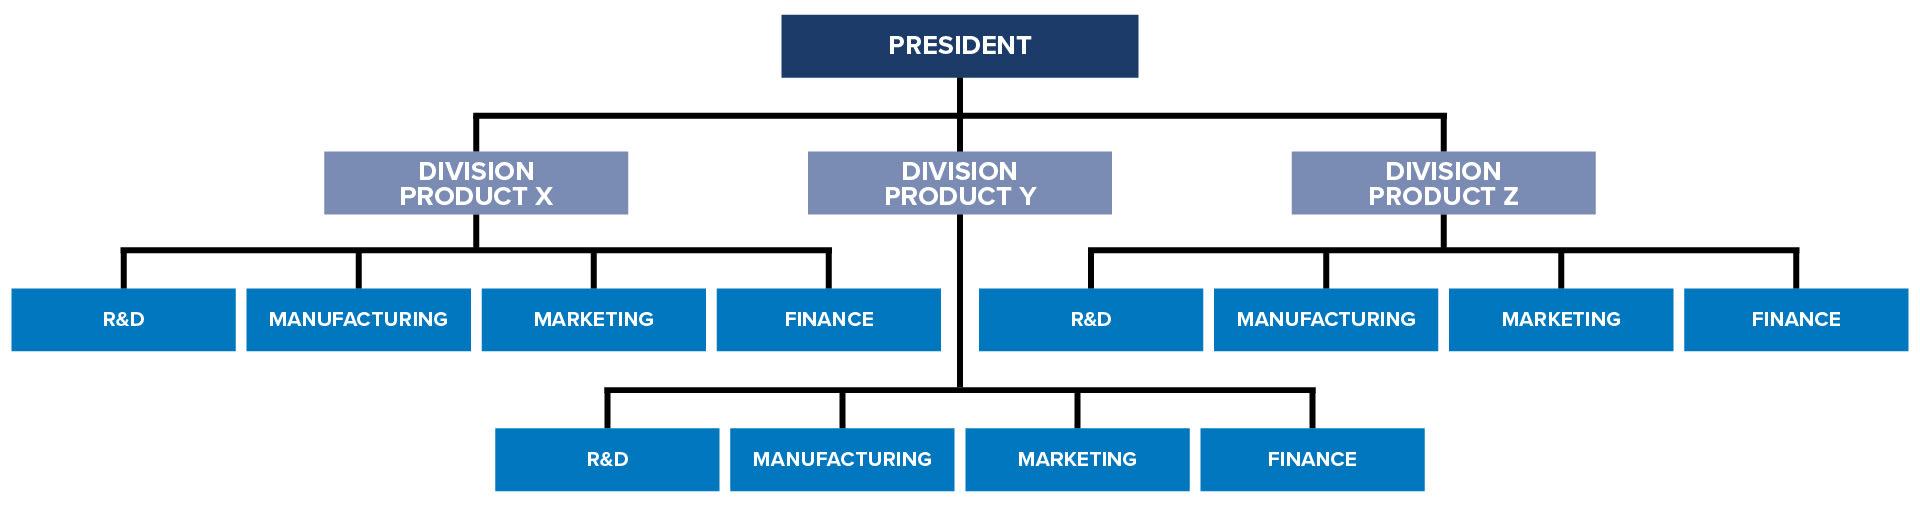 Understanding Organizational Structures